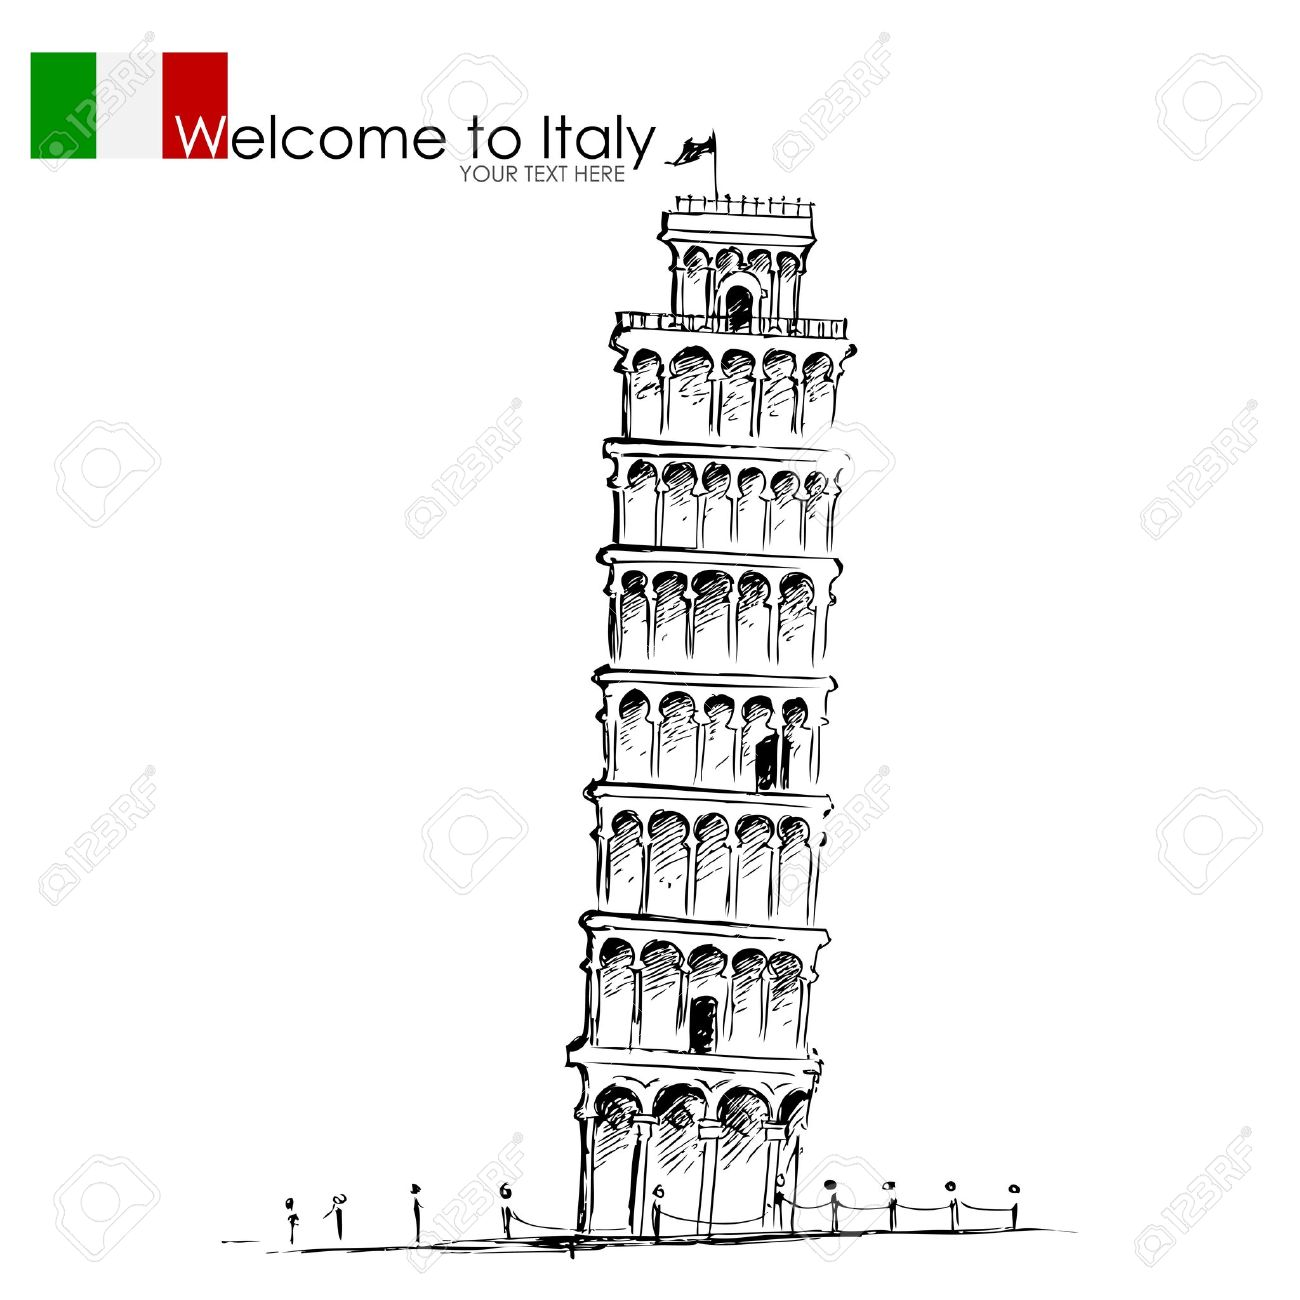 710 roman catholic church stock vector illustration and royalty